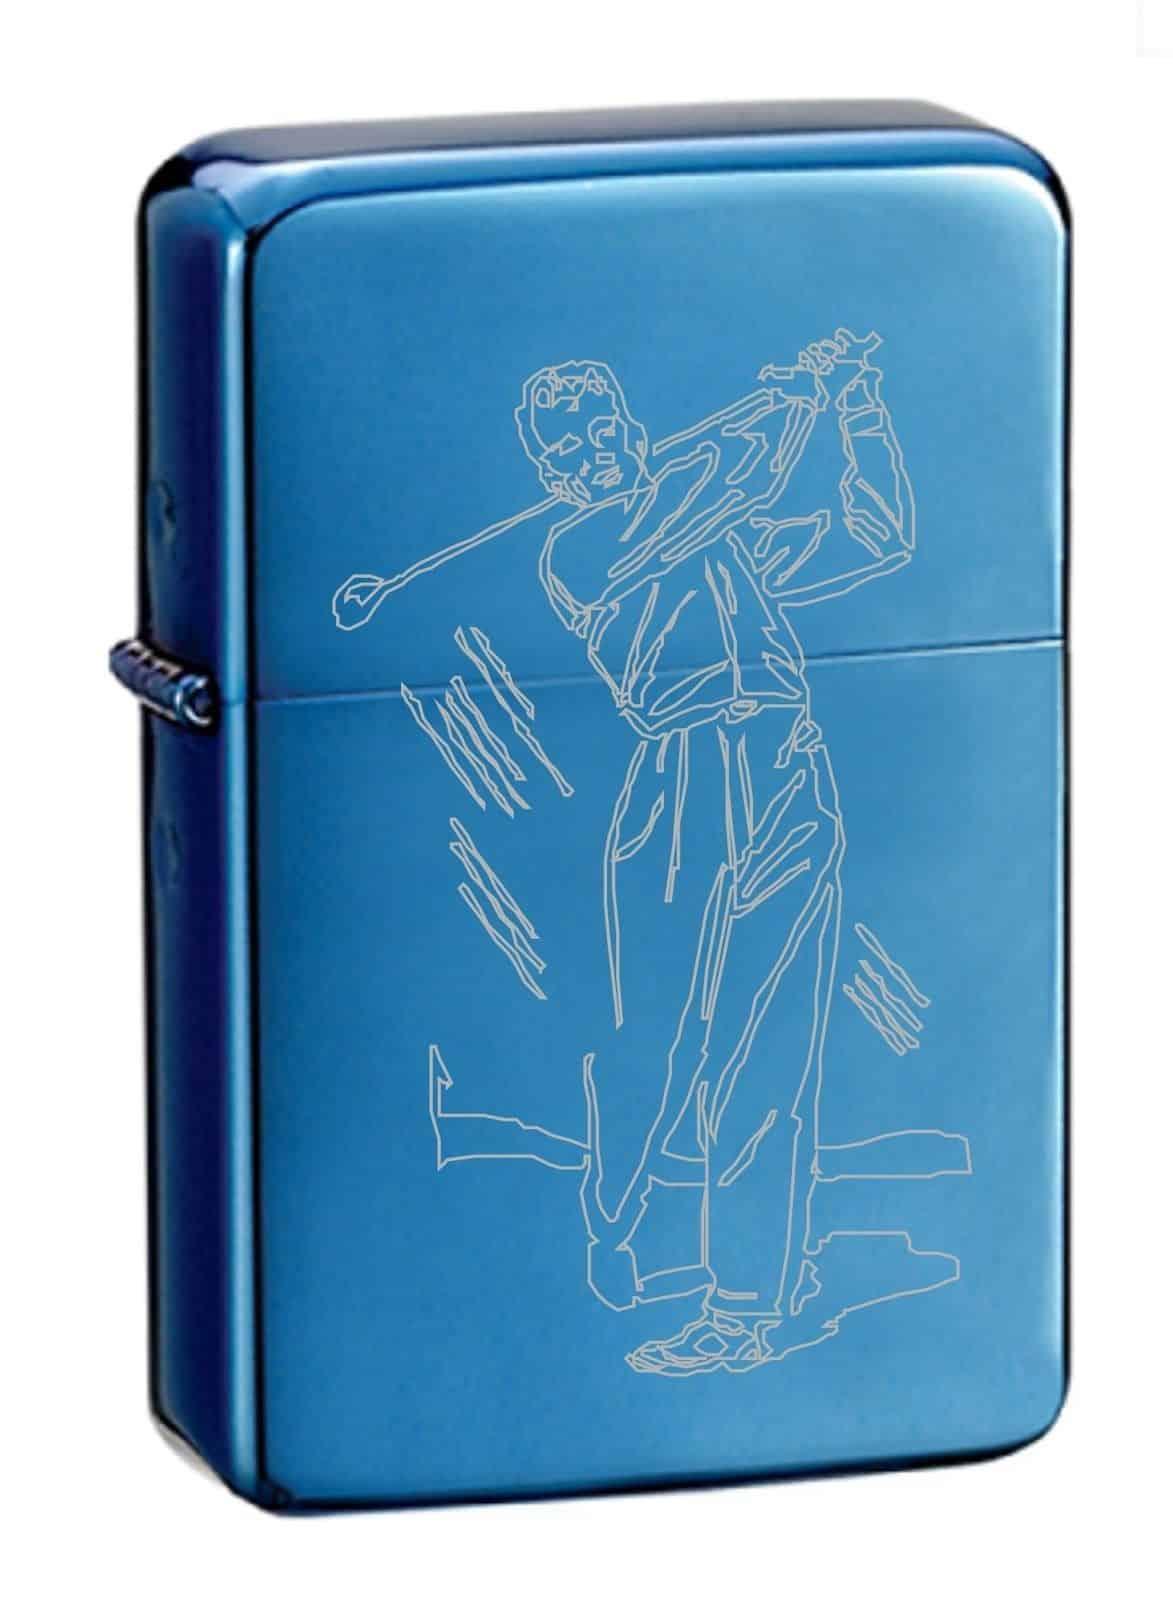 golfer-blue-ice